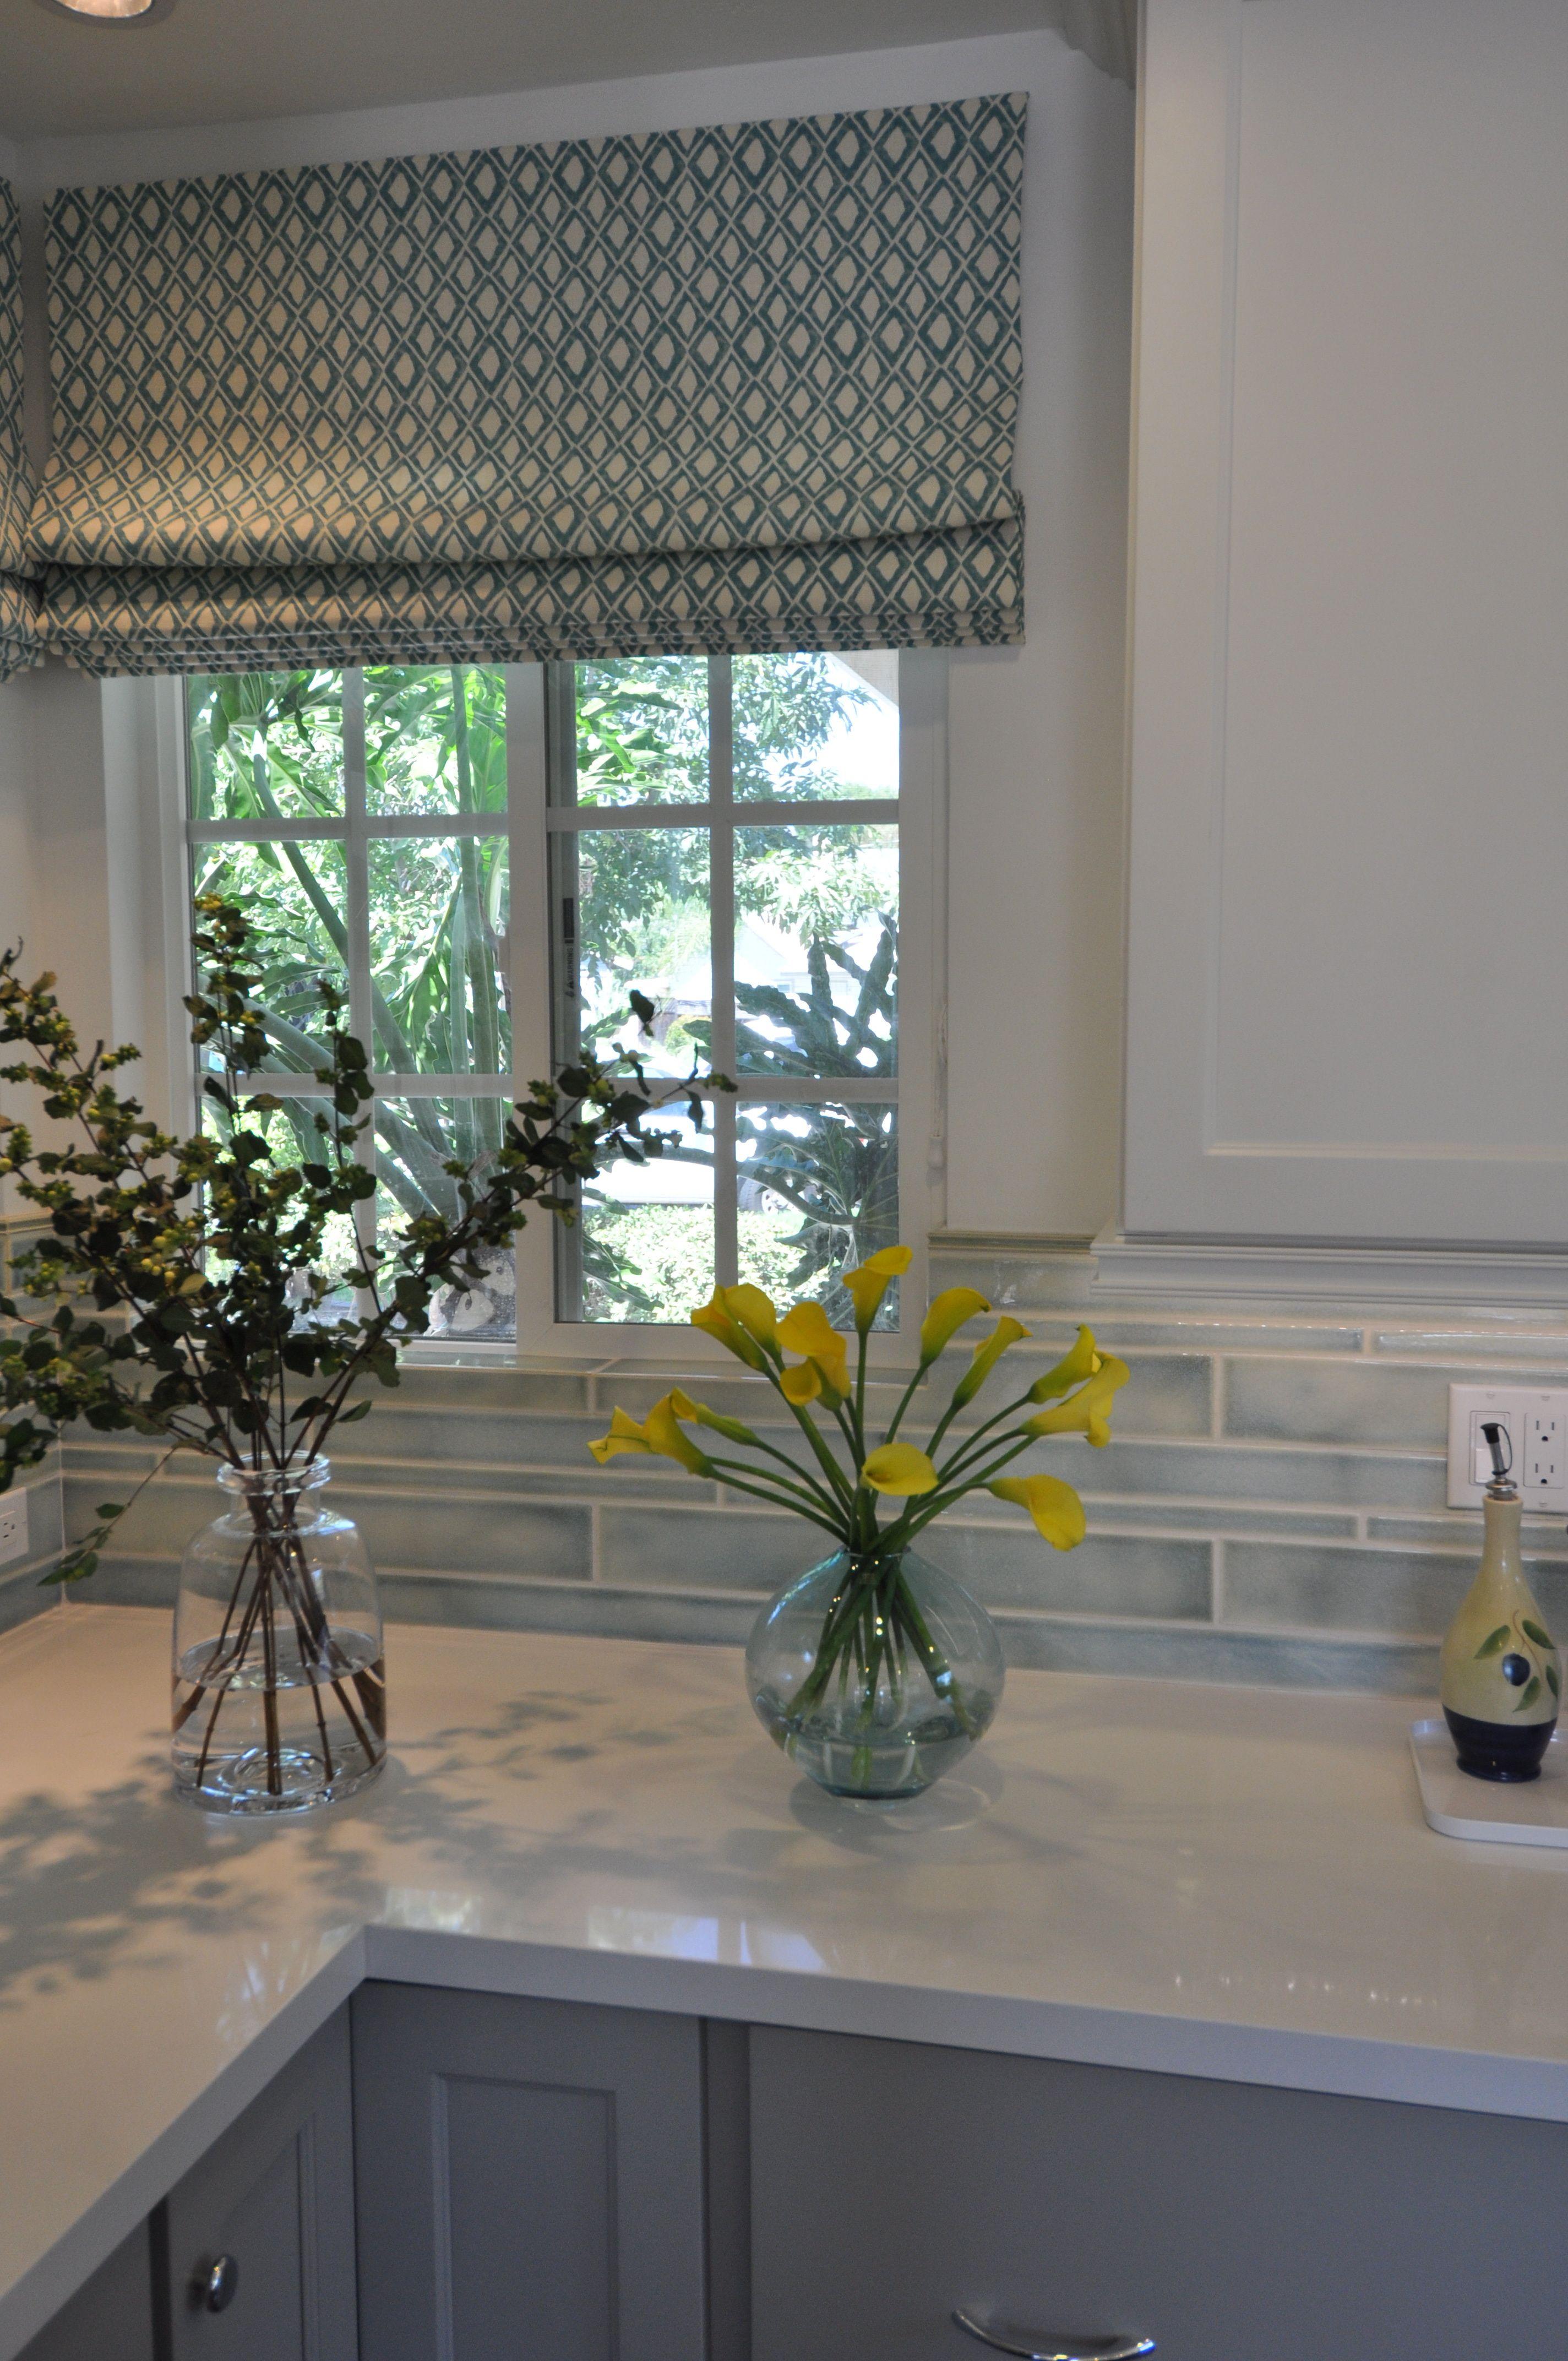 Creative Kitchen Window Treatments Hgtv Pictures Ideas: Joni Koenig Interiors Out Of Santa Monica, CA Starred In A